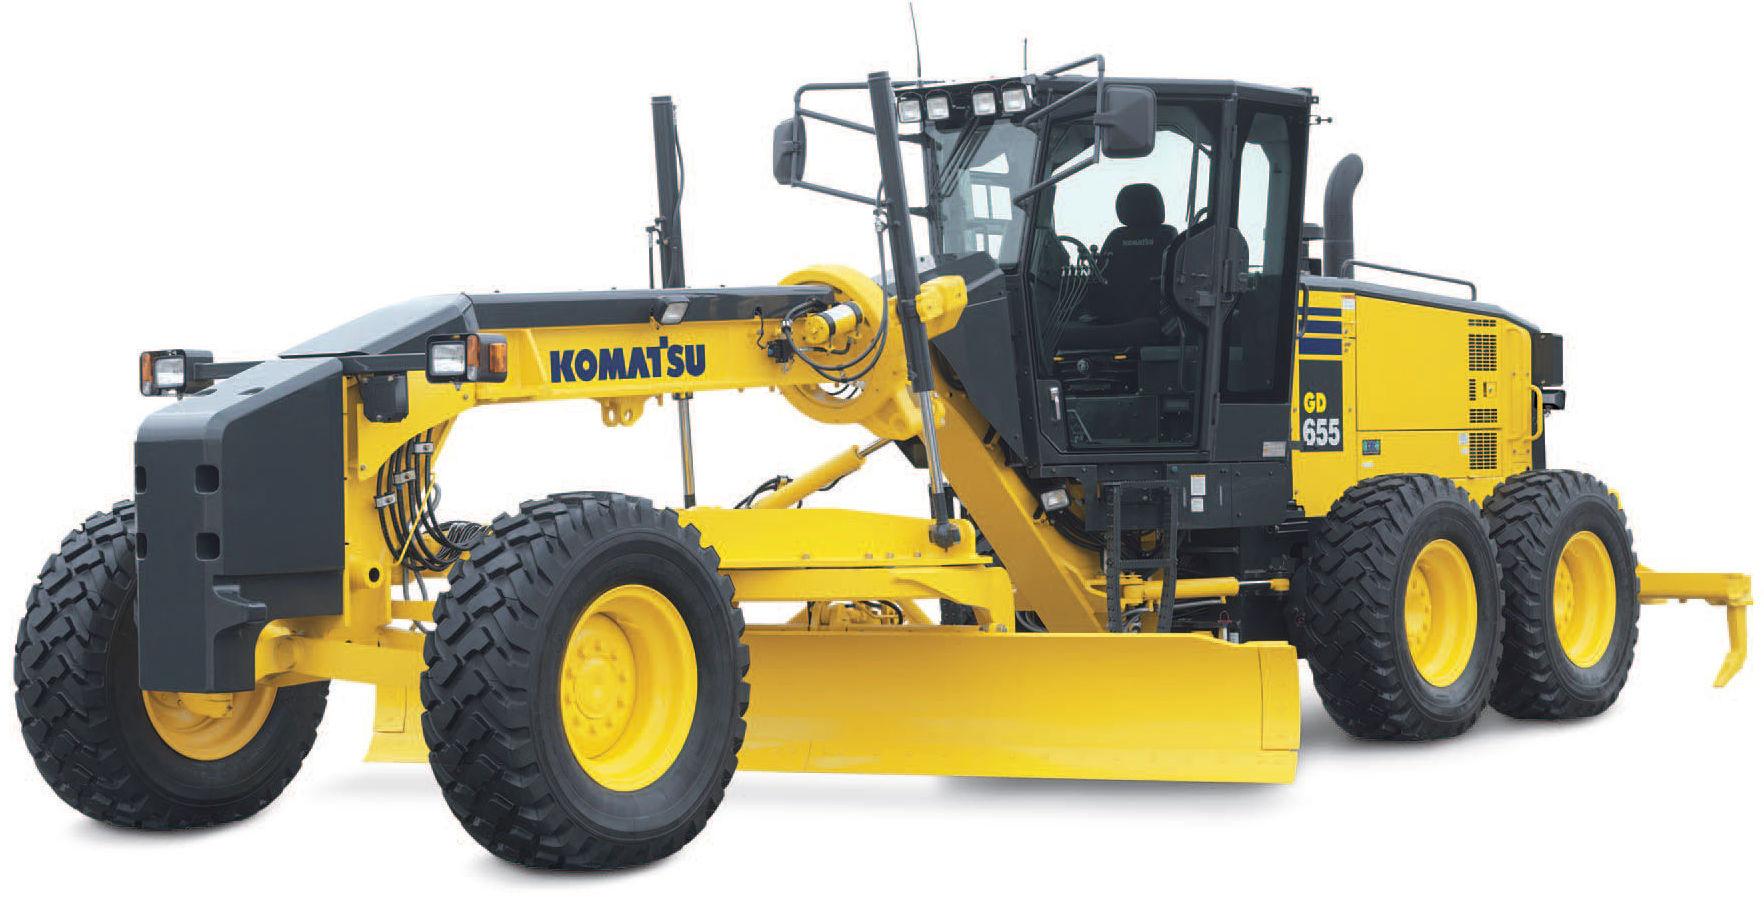 Komatsu Motor Grader GD555, GD655, GD675 Workshop Repair & Service Manual